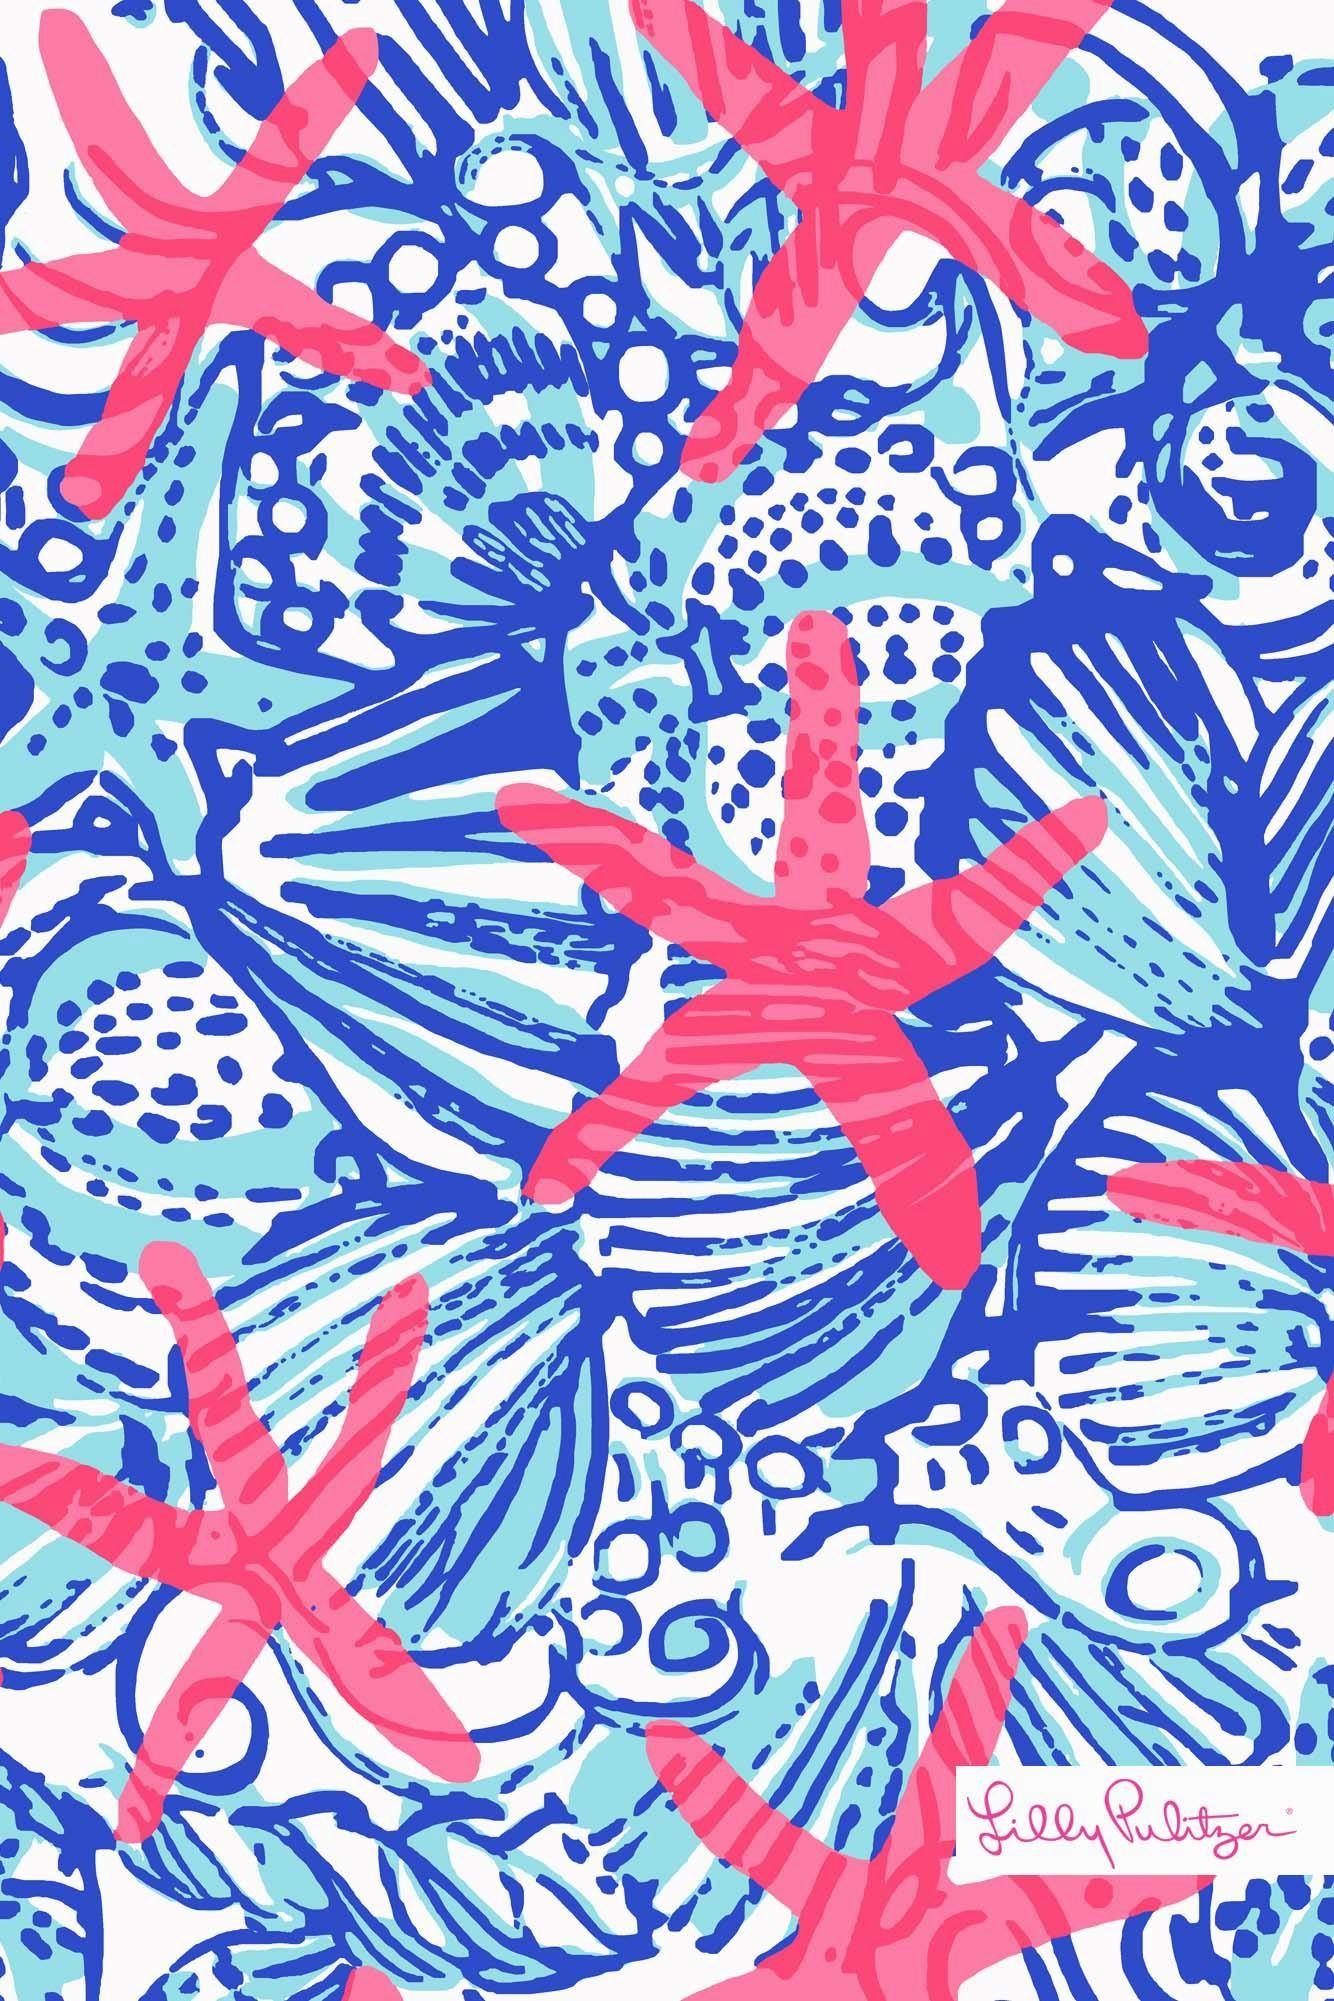 Lilly-Pulitzer-SummerSheSheShells-iphone-wallpaper-wallpaper-1